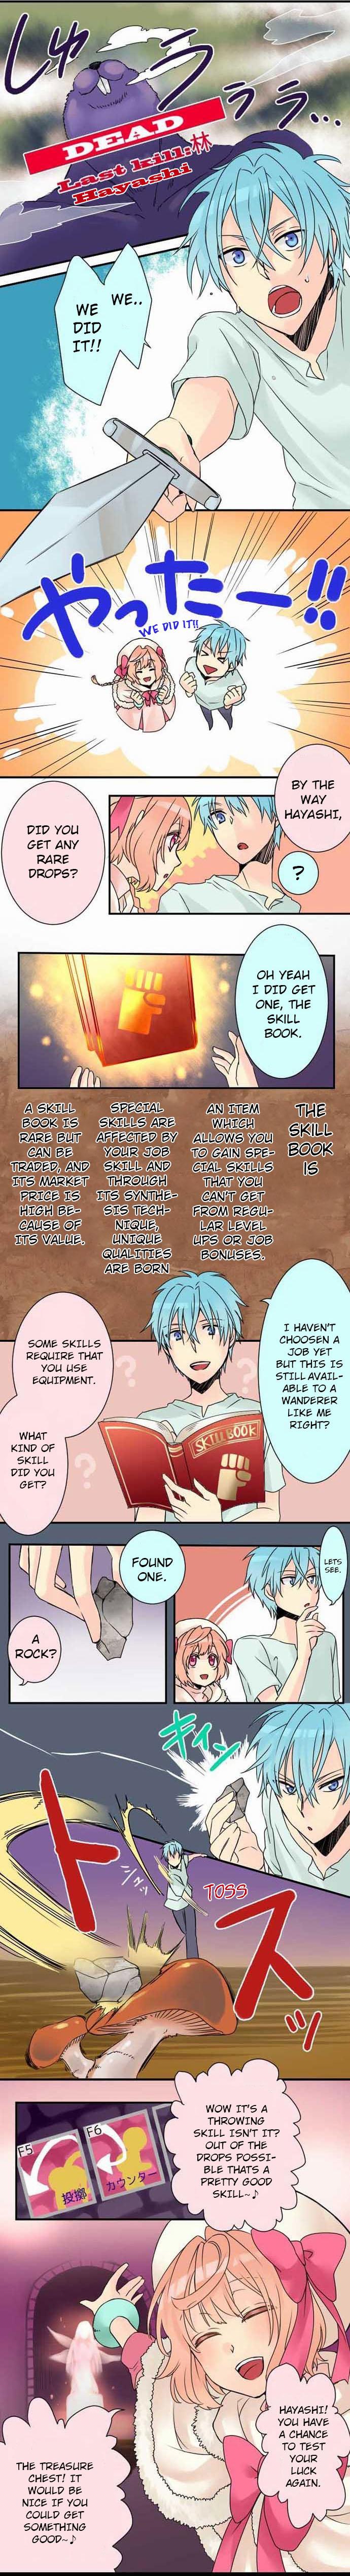 Netojuu no Susume - Chapter 4